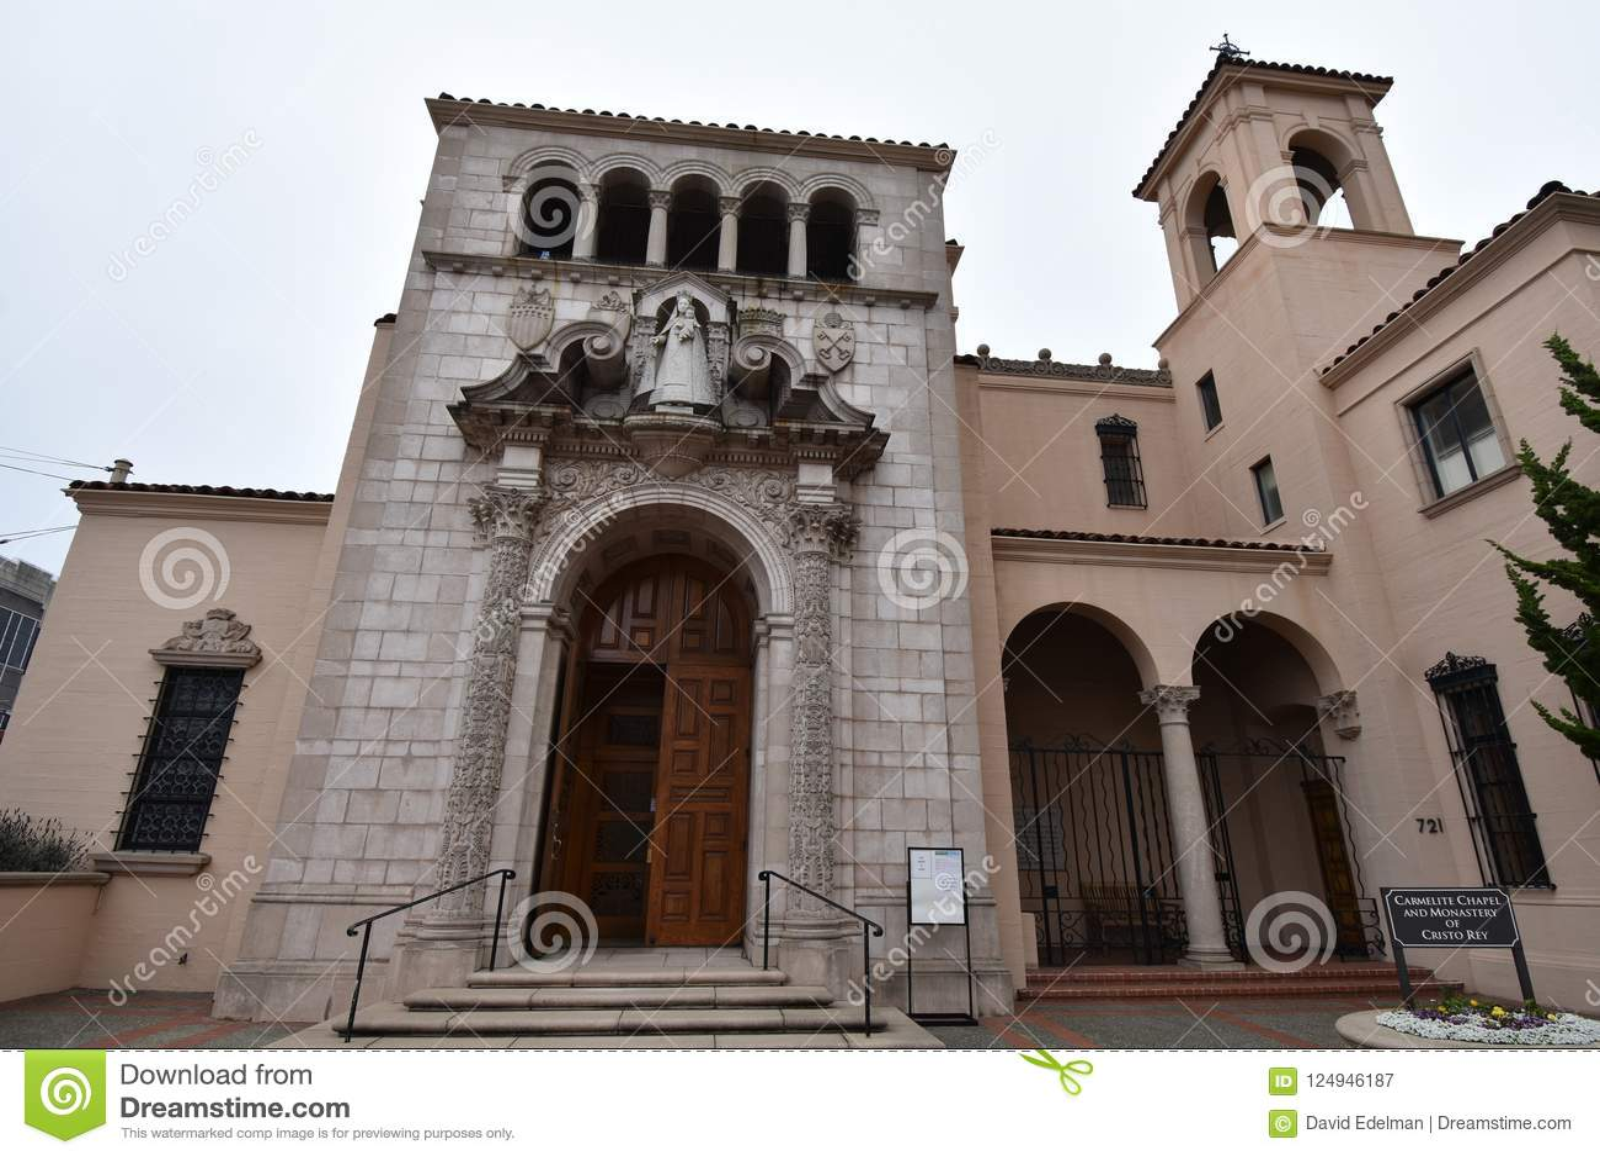 The Carmelite Monastery Of Cristo Rey, San Francisco, 1  Stock Image